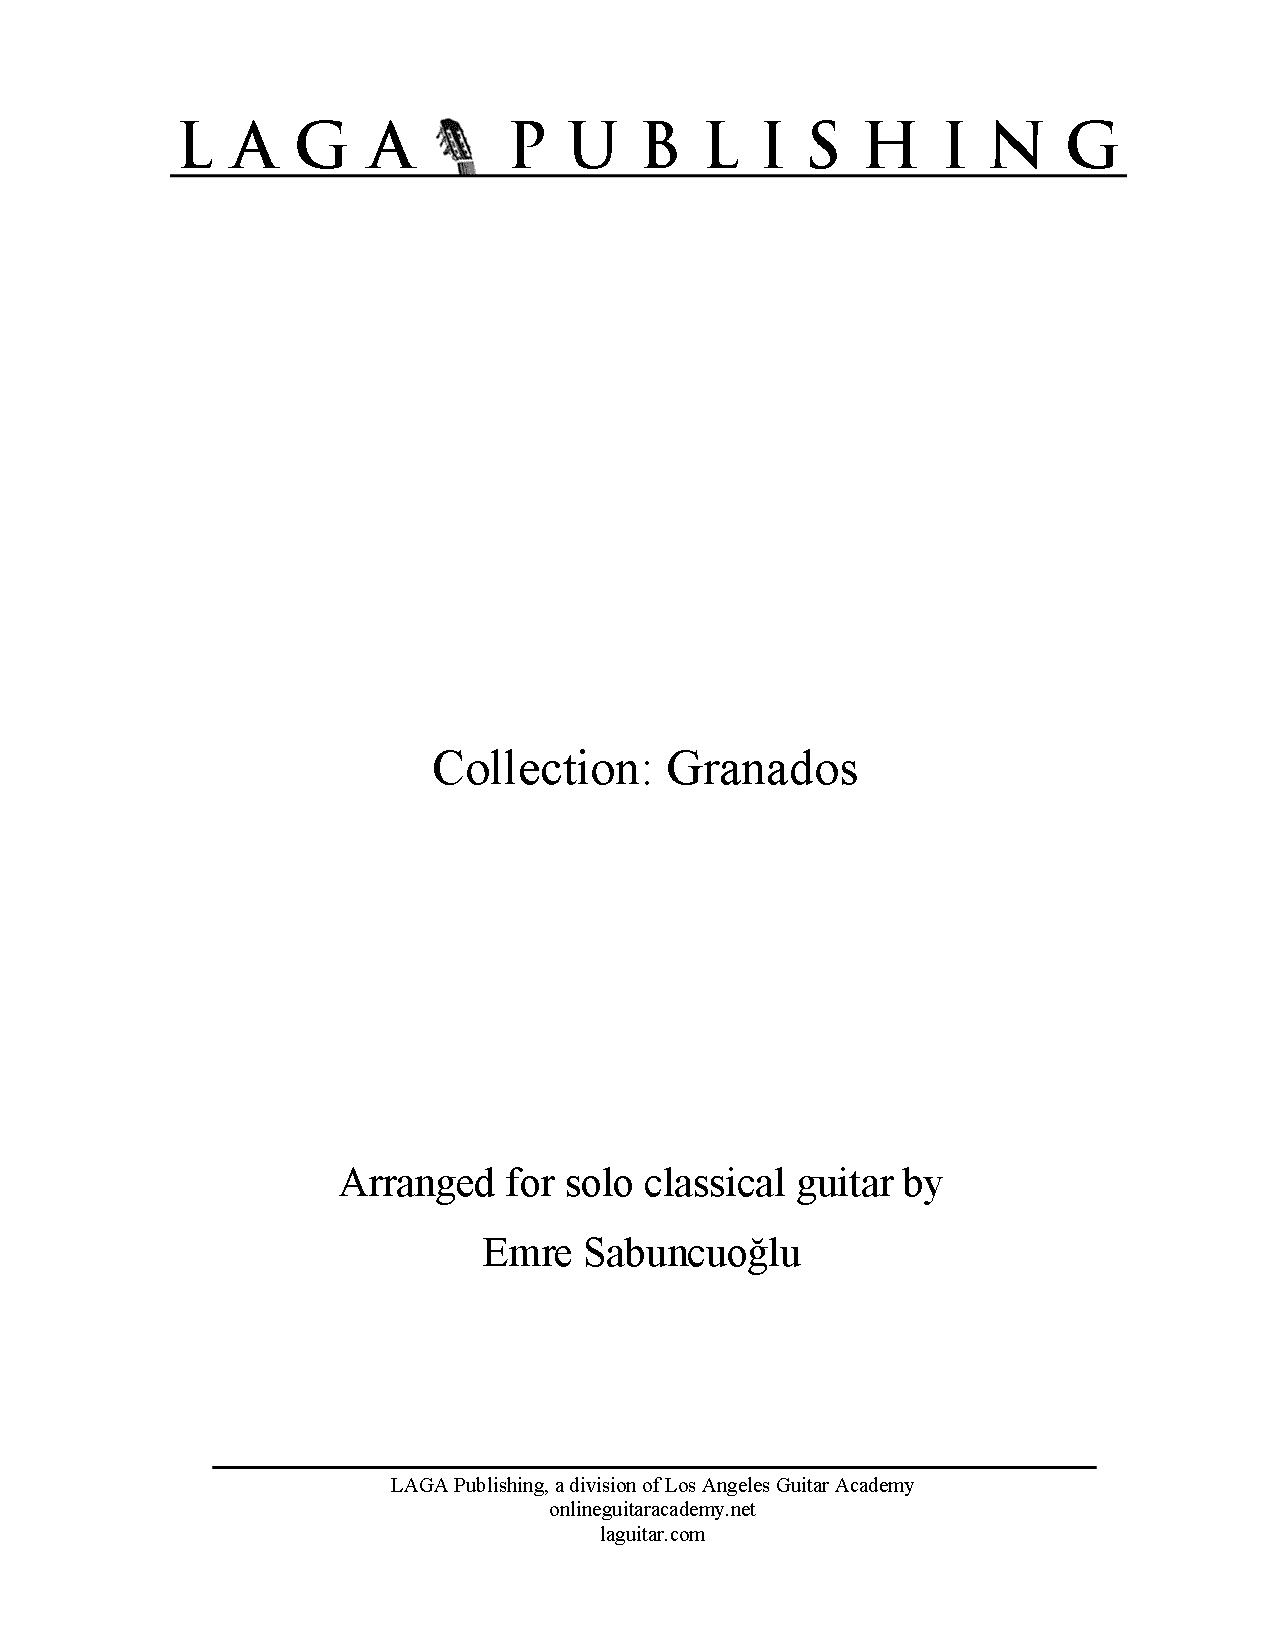 LAGA-Publishing-collection-Granados